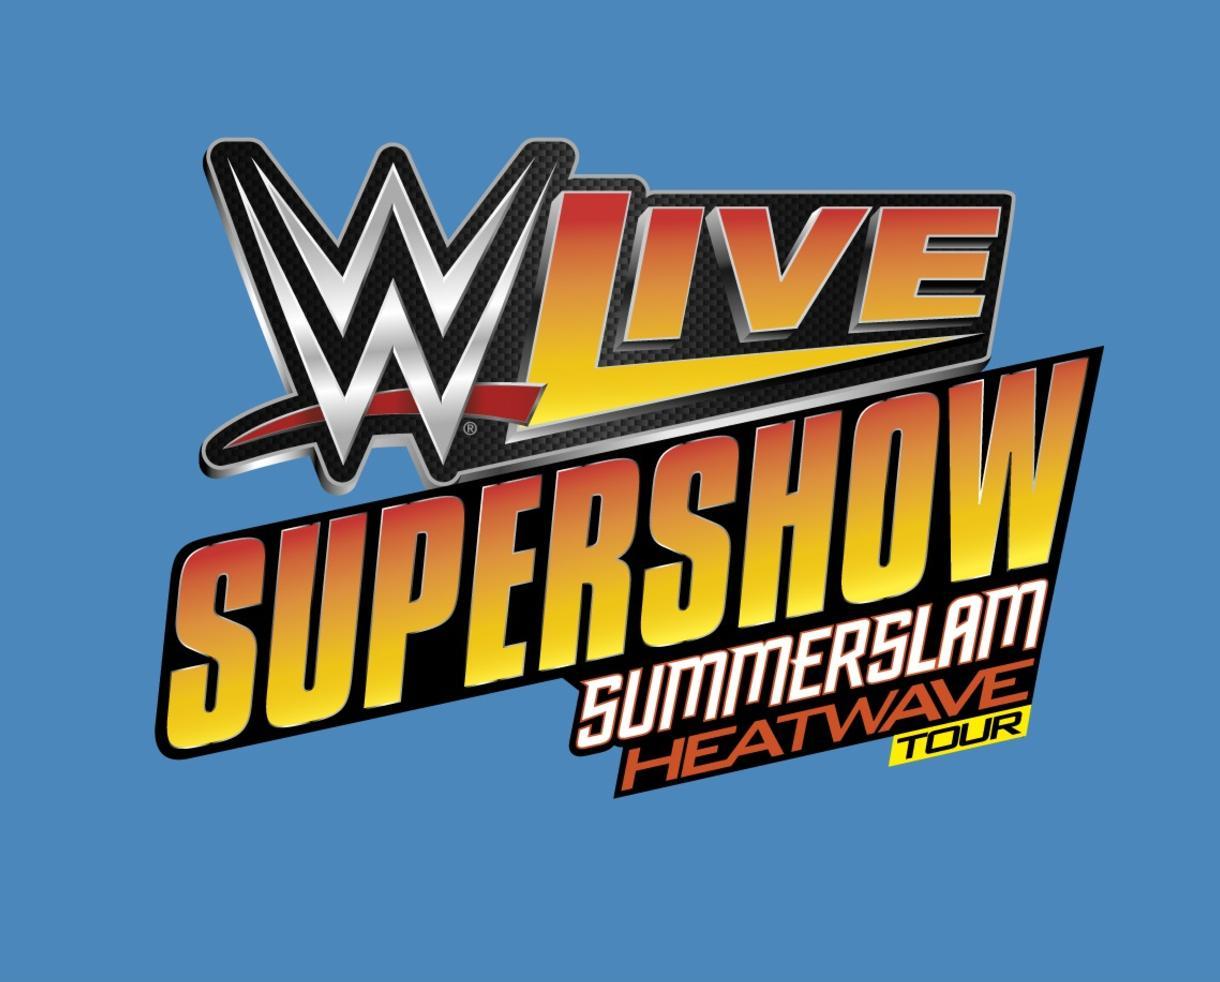 Deal 19 for ticket to wwe live summerslam heatwave tour - Louis ck madison square garden december 14 ...